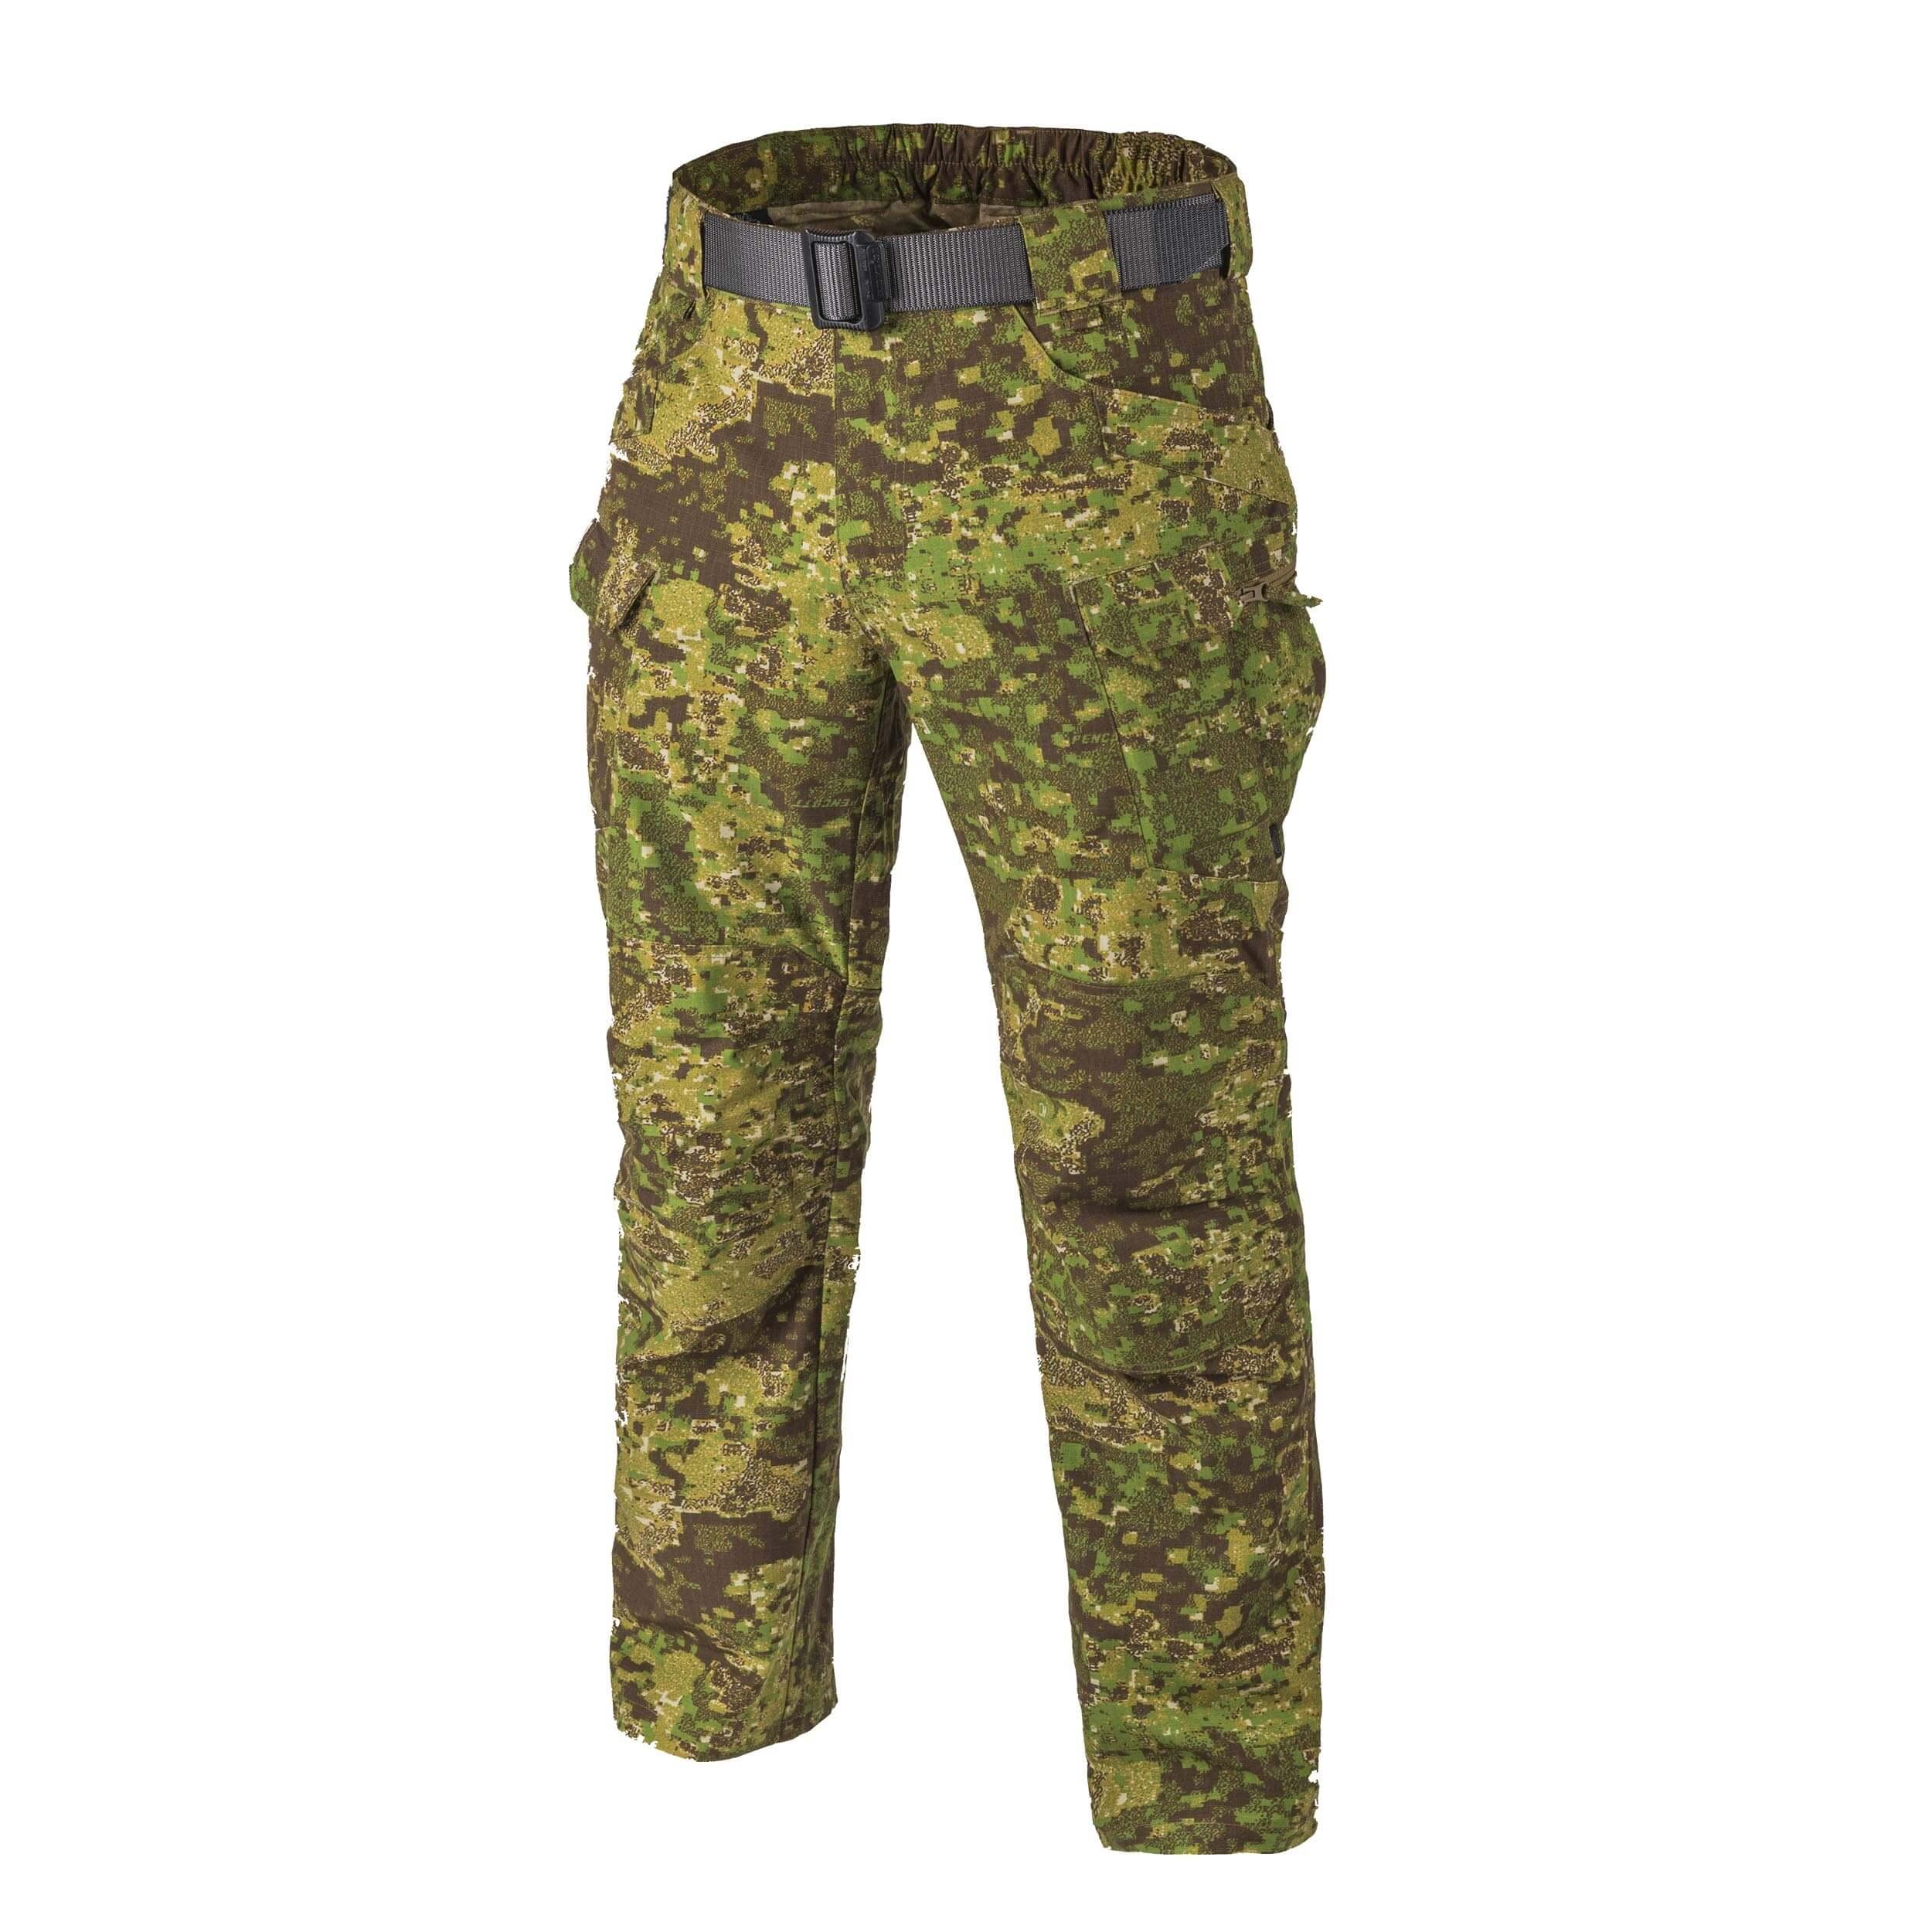 Helikon-Tex Urban Tactical Pants Ripstop PenCott Greenzone